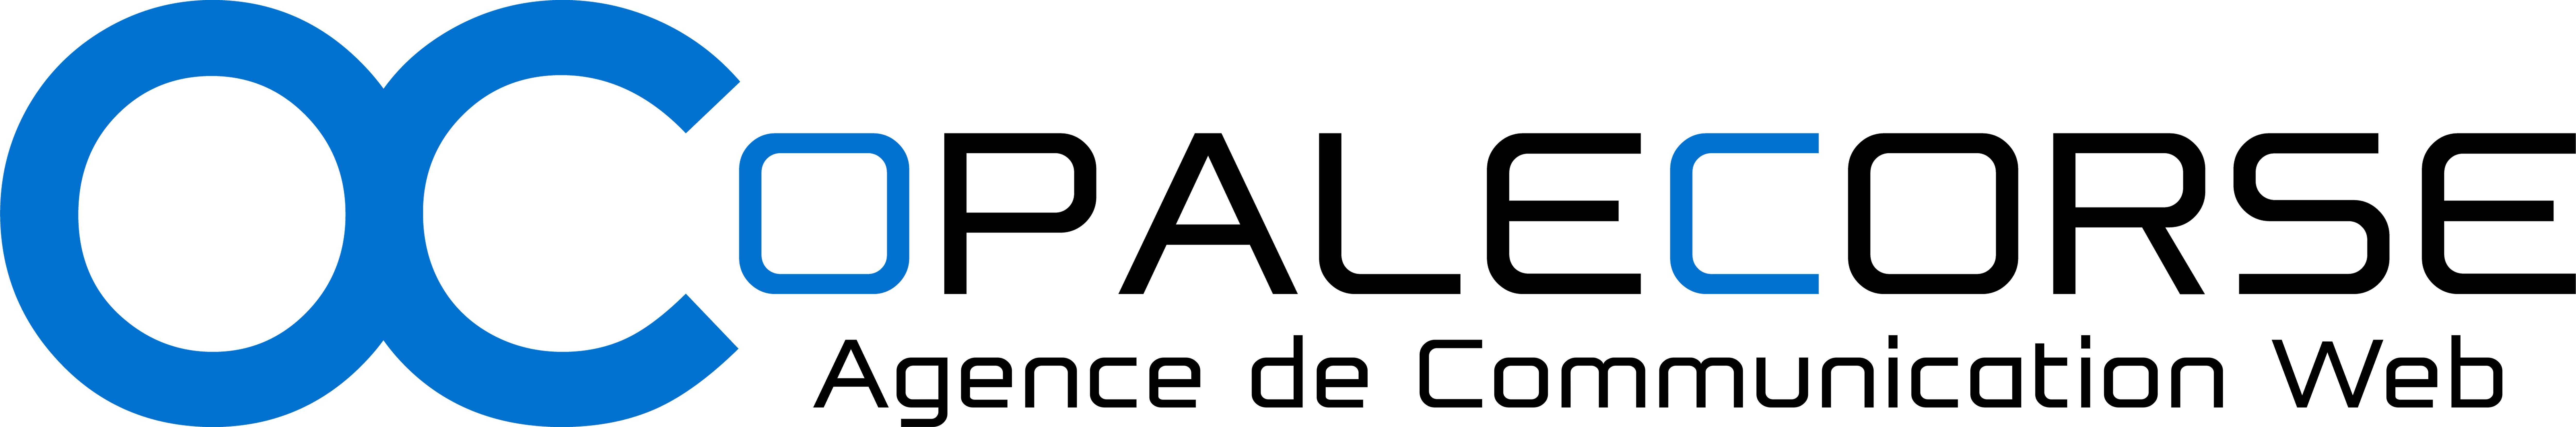 logo-opale-corse